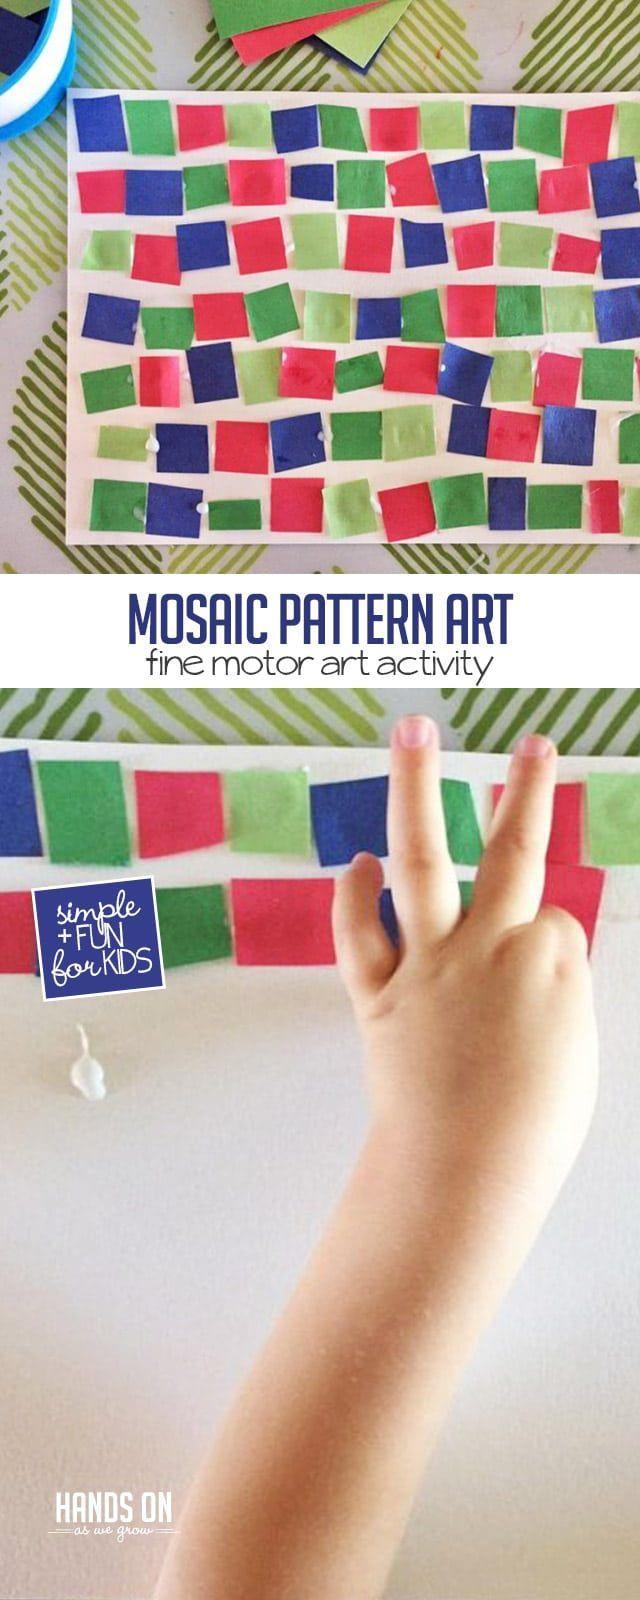 Super Simple Fine Motor Mosaic Pattern Art Activity For Kids Hoawg Art Activities For Kids Fine Motor Activities For Kids Art Activities For Toddlers [ 1600 x 640 Pixel ]